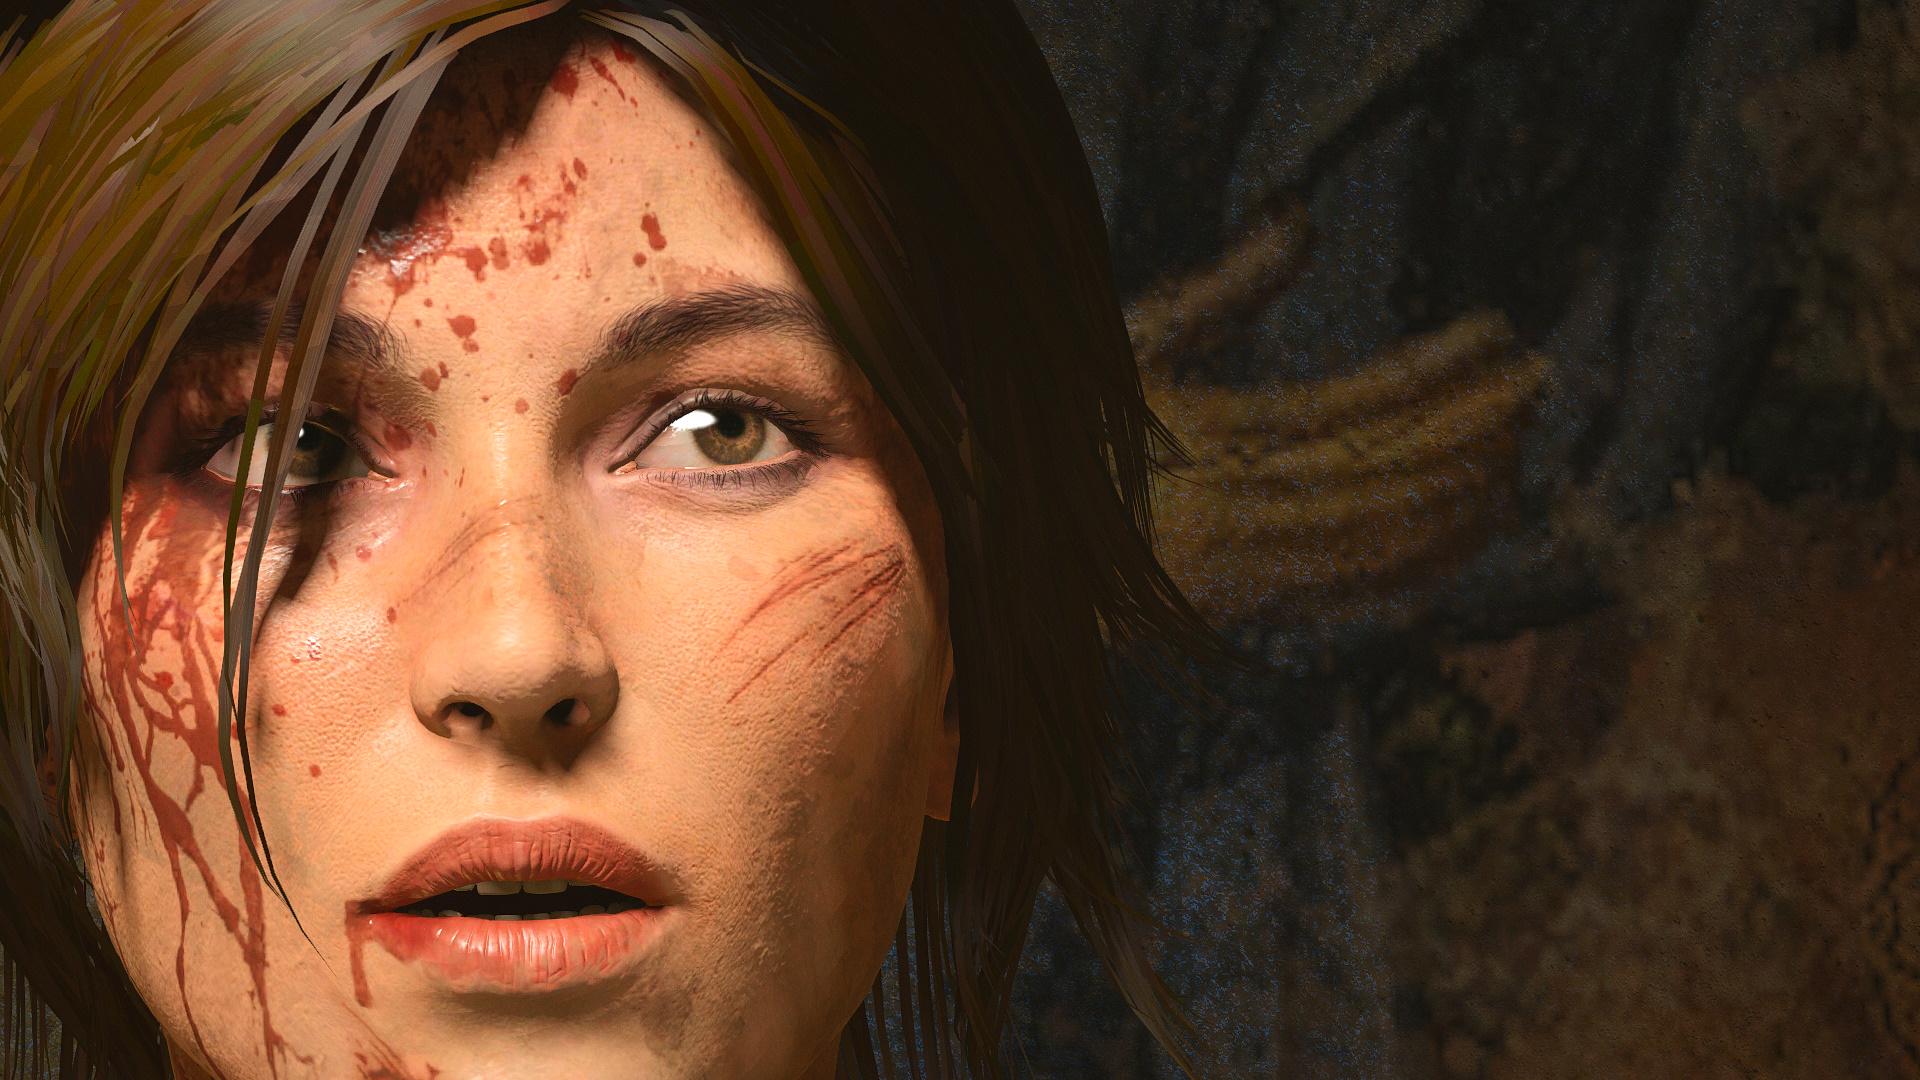 ROTTR 2017-09-20 16-42-57-653.jpg - Rise of the Tomb Raider